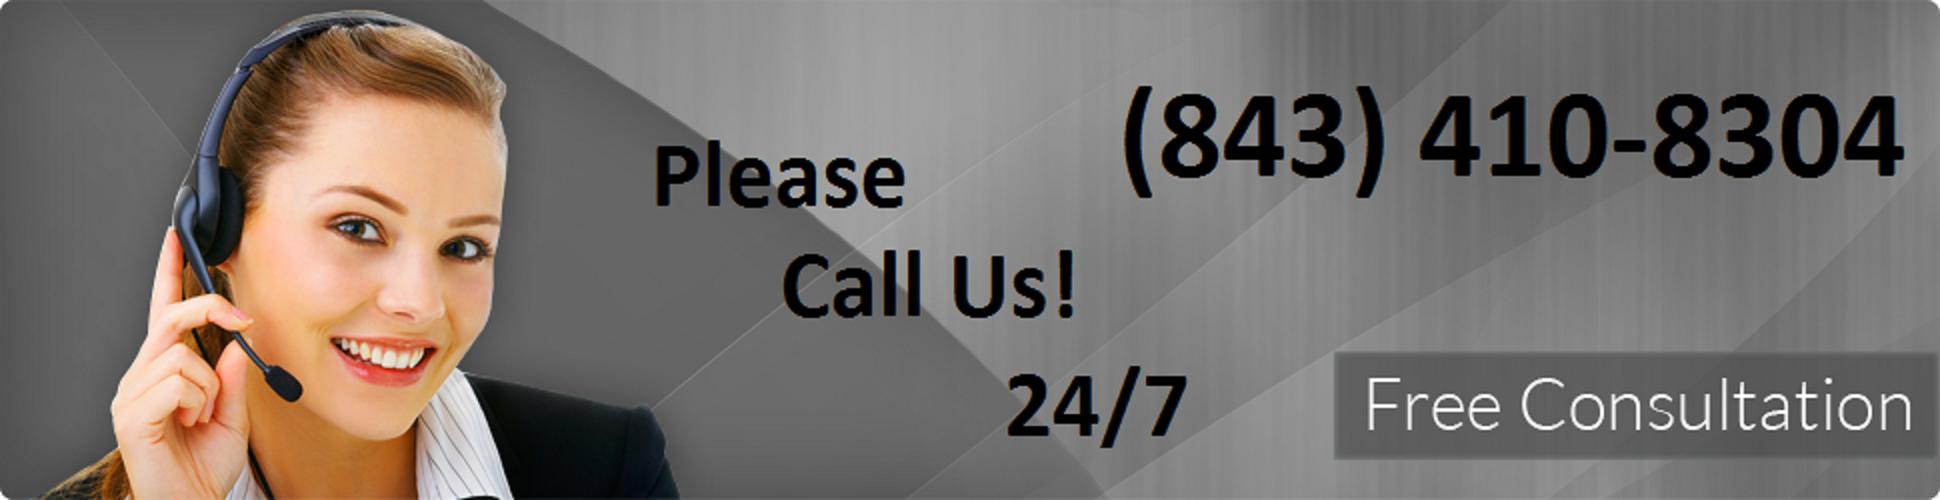 Bulldgo PI, LLC Free Consultation